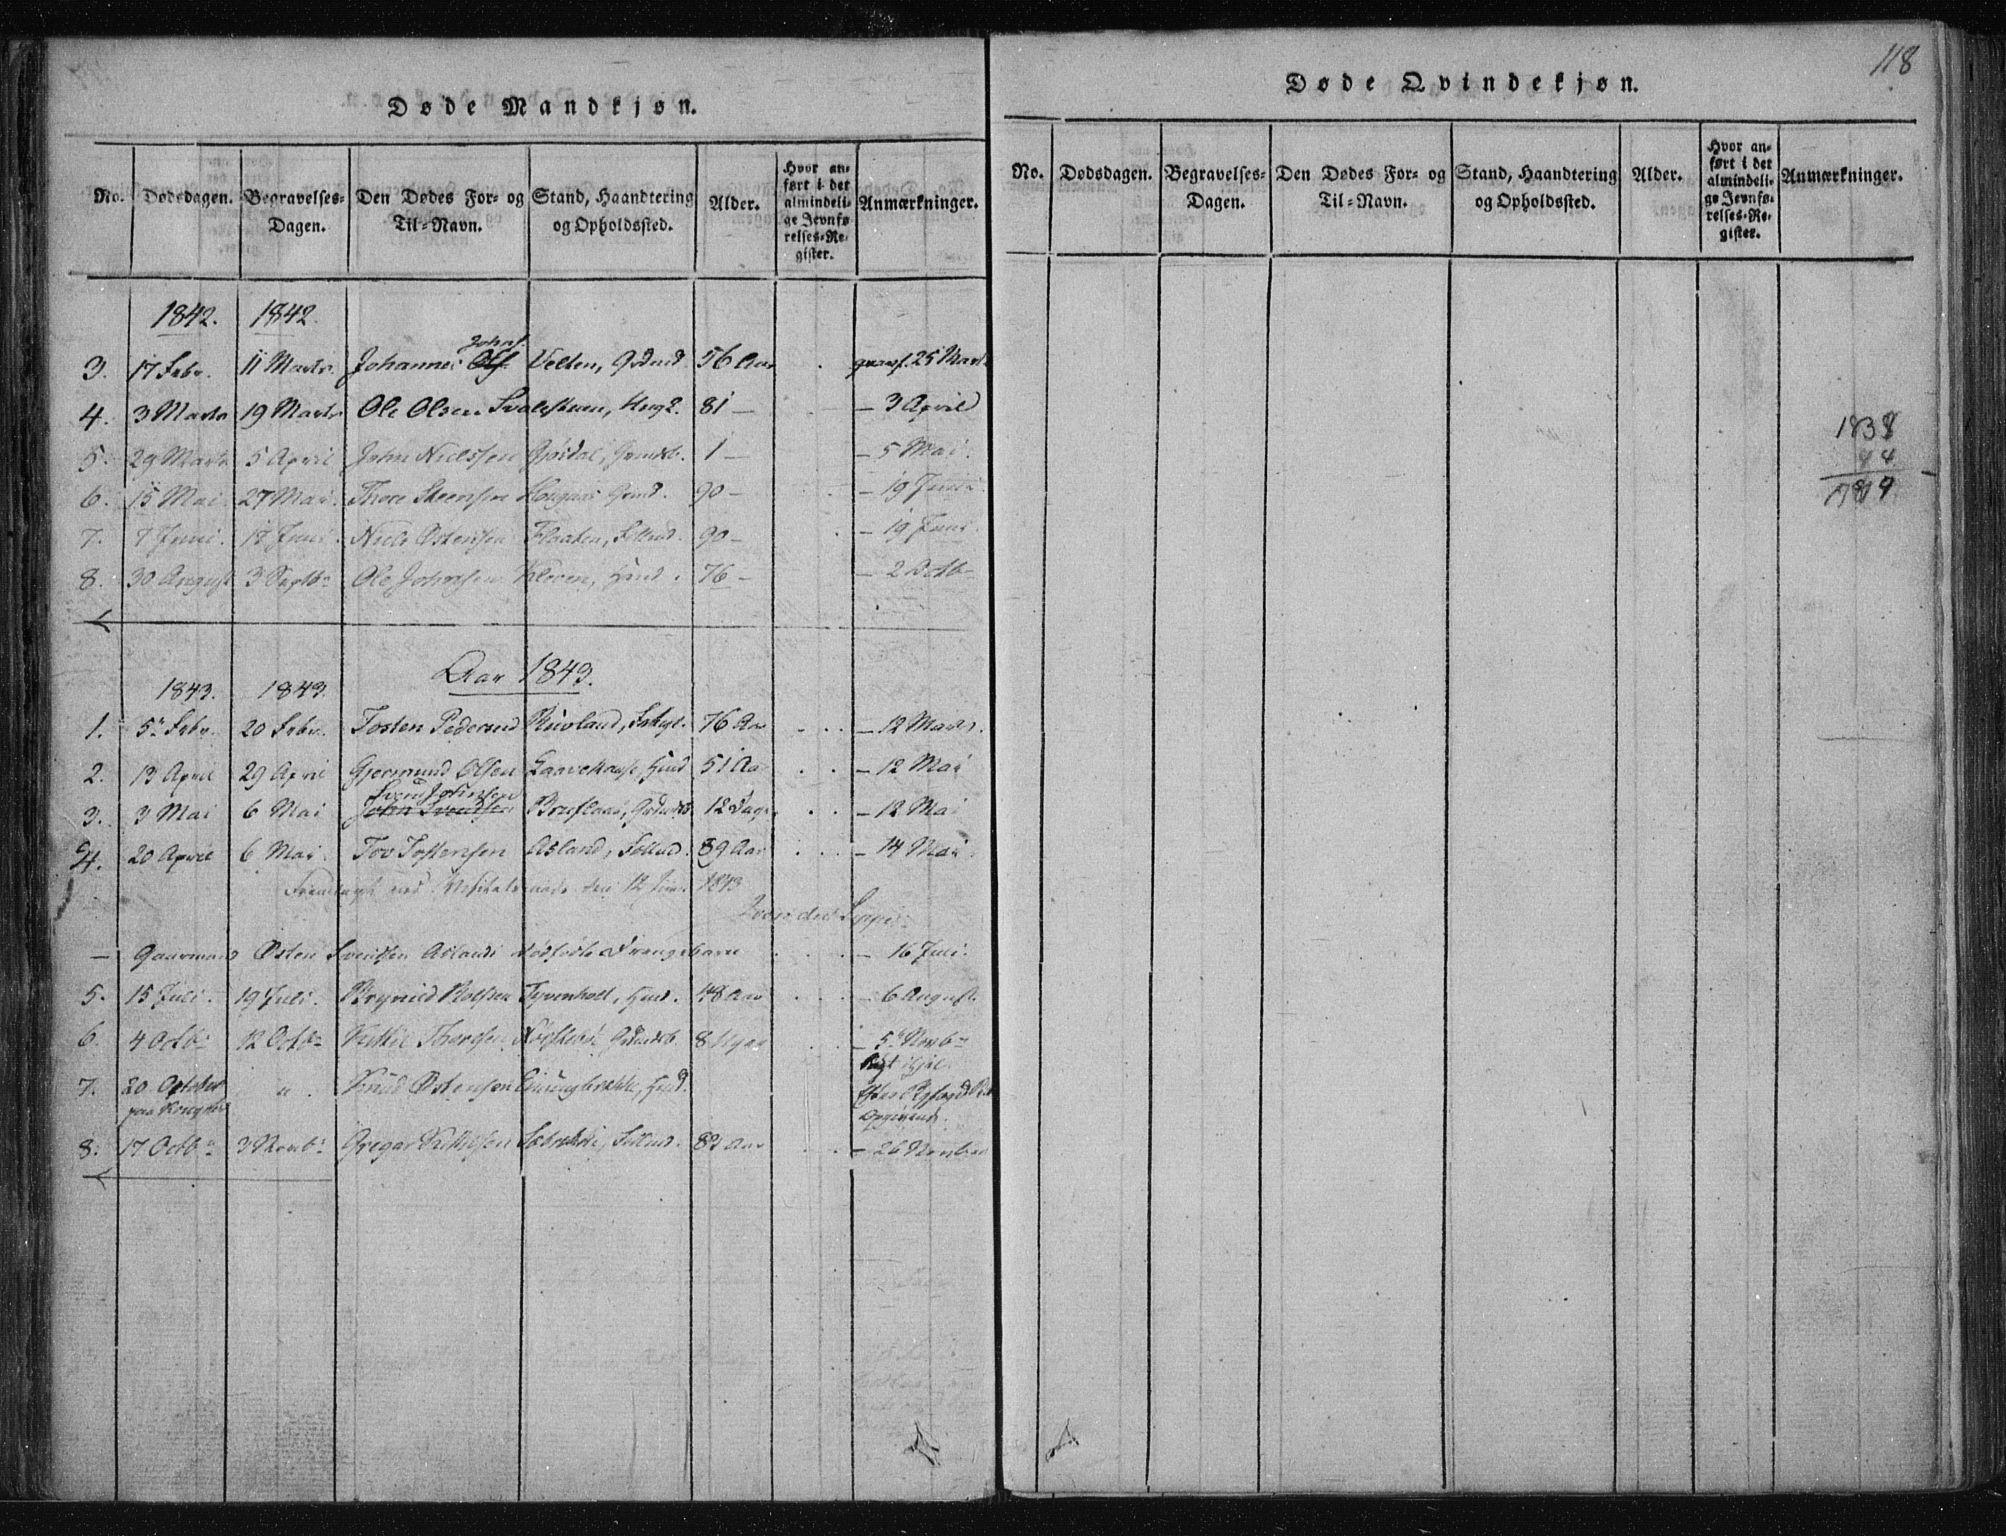 SAKO, Tinn kirkebøker, F/Fa/L0004: Ministerialbok nr. I 4, 1815-1843, s. 118